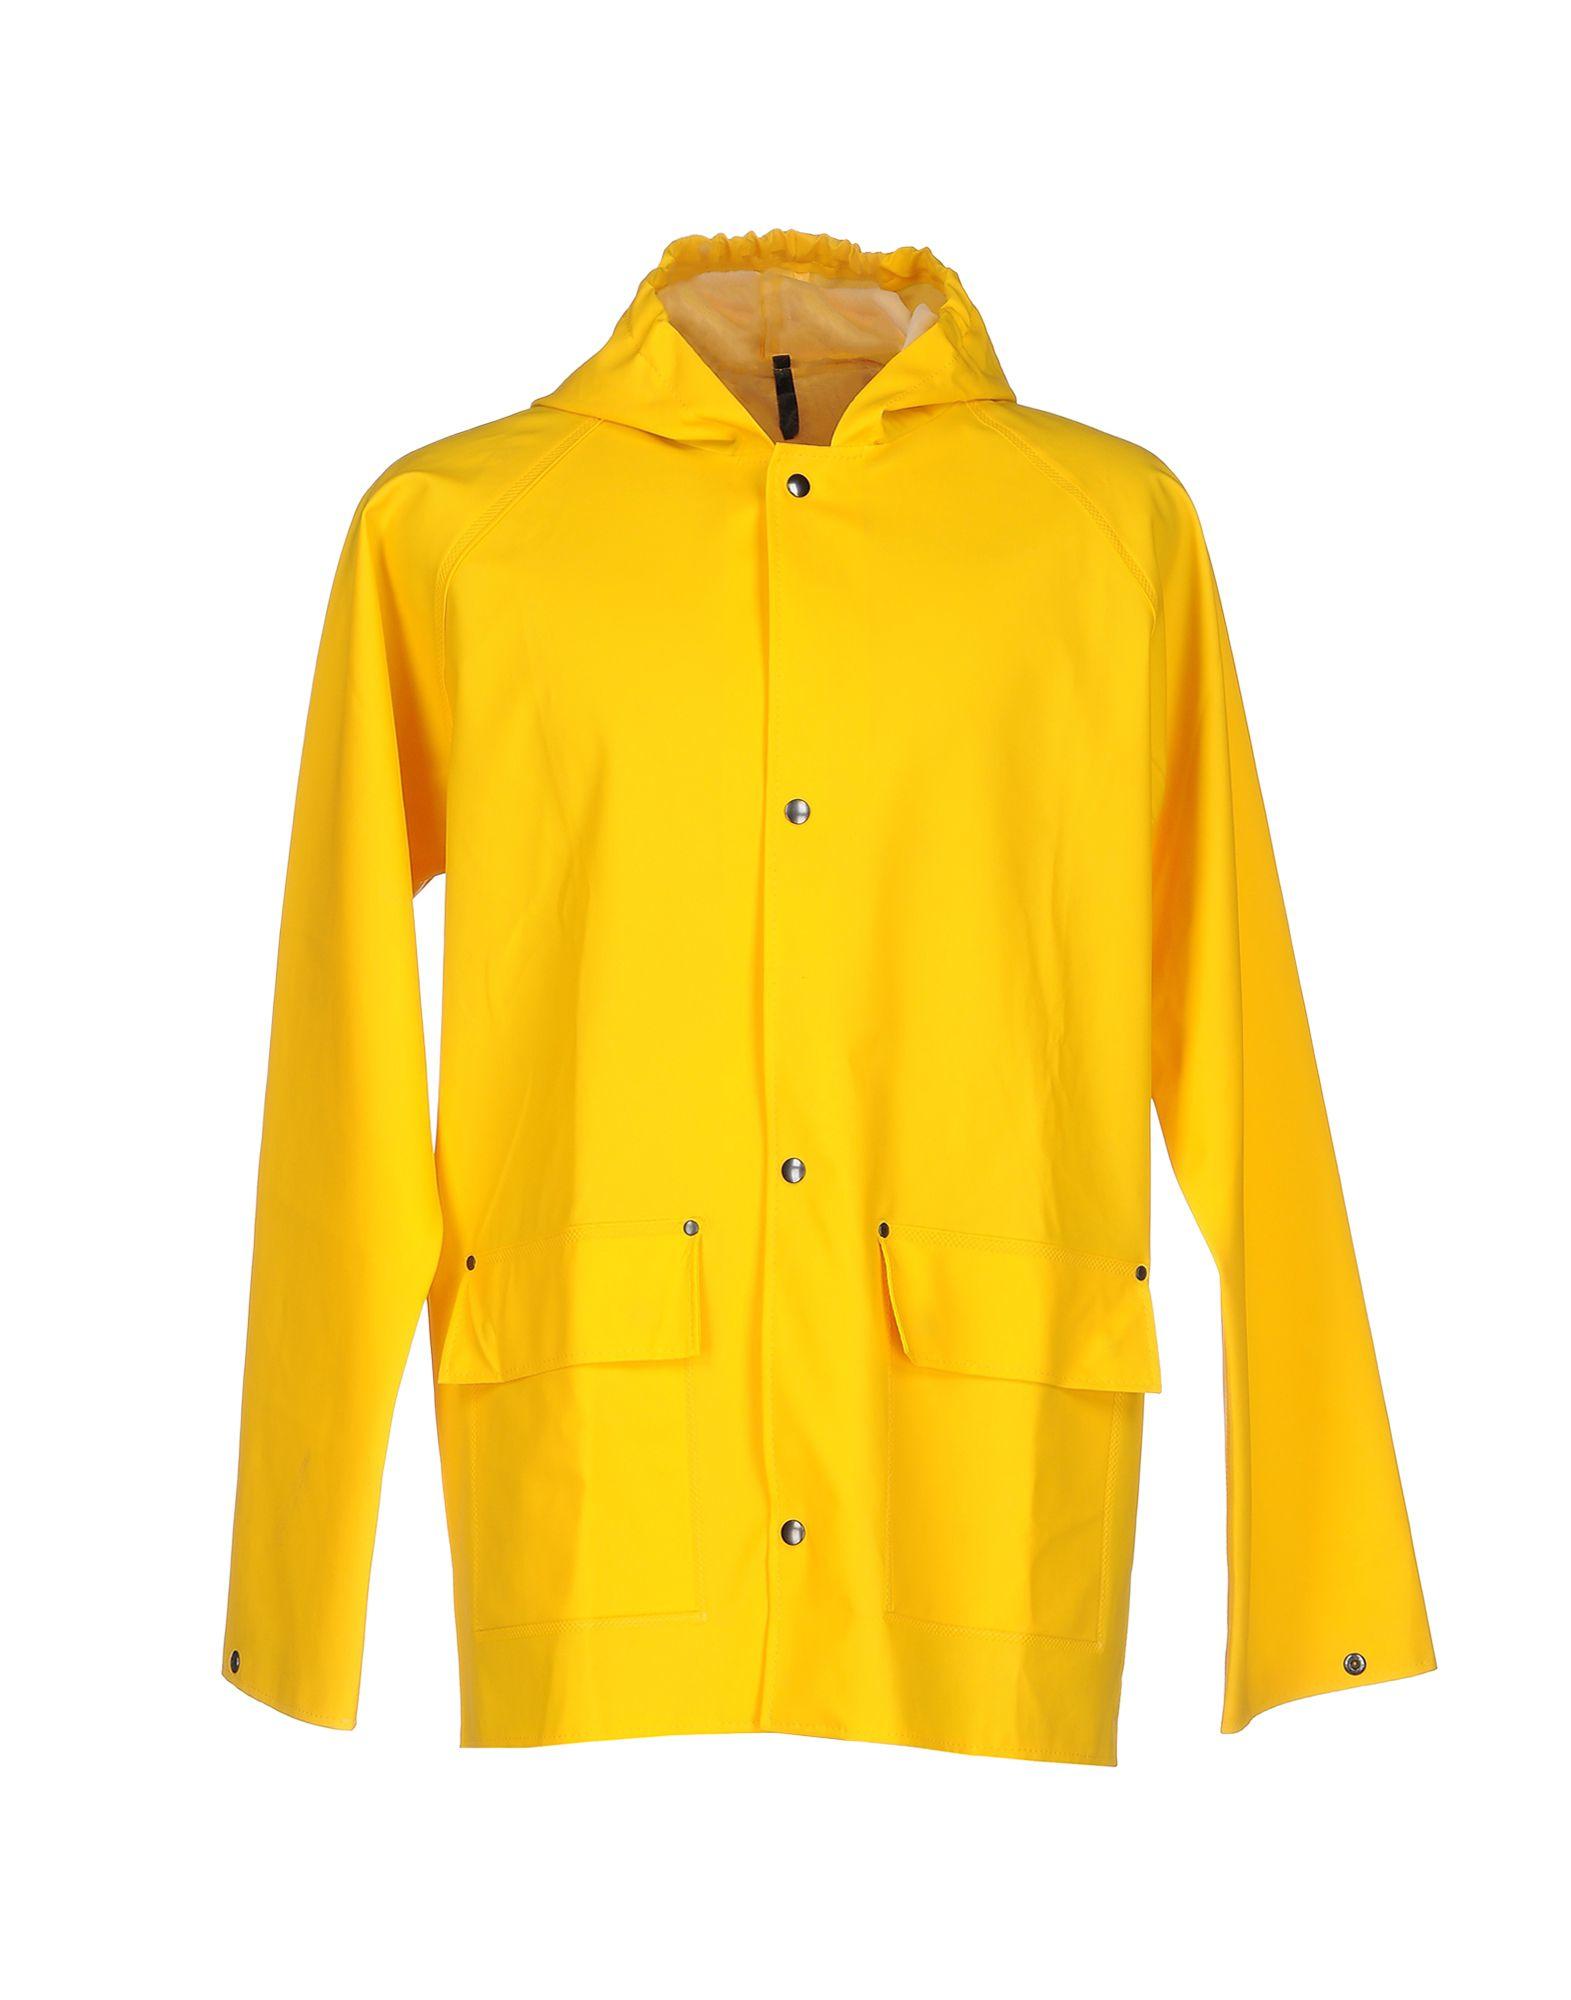 Elka Jacket in Yellow for Men | Lyst